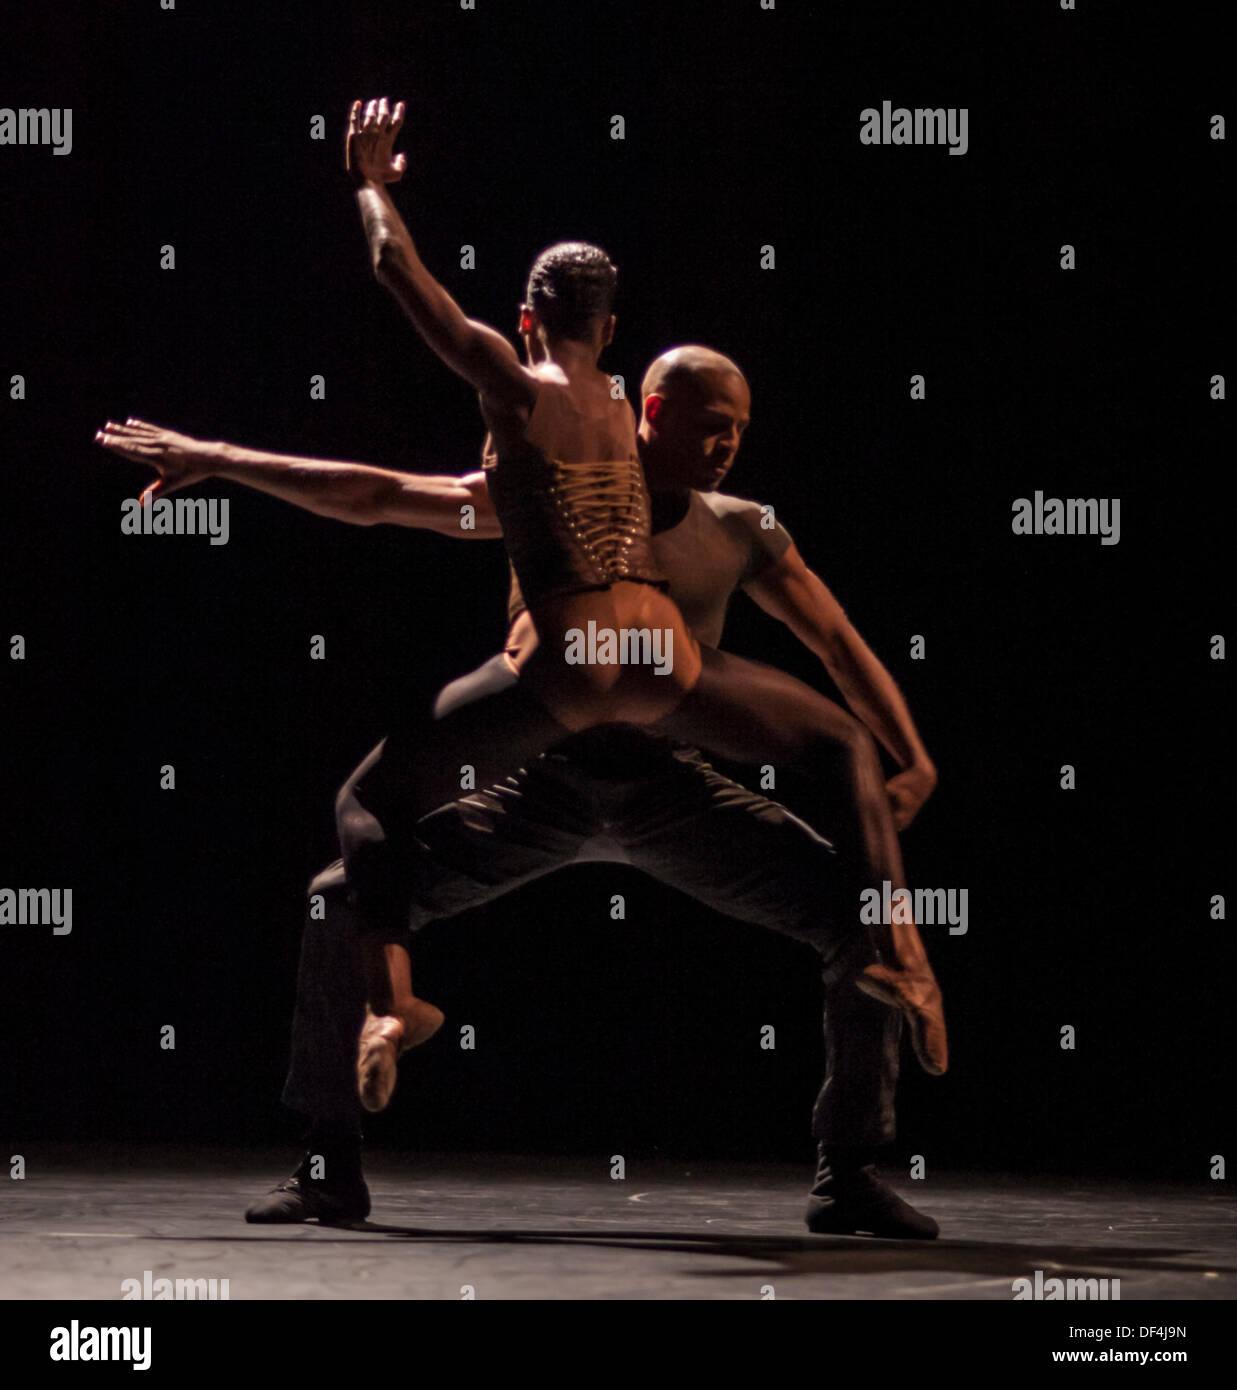 Sadler's Wells, London. 27th Sept, 2013. Part of Indigo Rose choreographed by Jirí Kylián , one of a triple bill by Cedar Lake Contemporary Ballet, Sadler's Wells. London. 27/09/13 Credit:  Carole Edrich/Alamy Live News - Stock Image